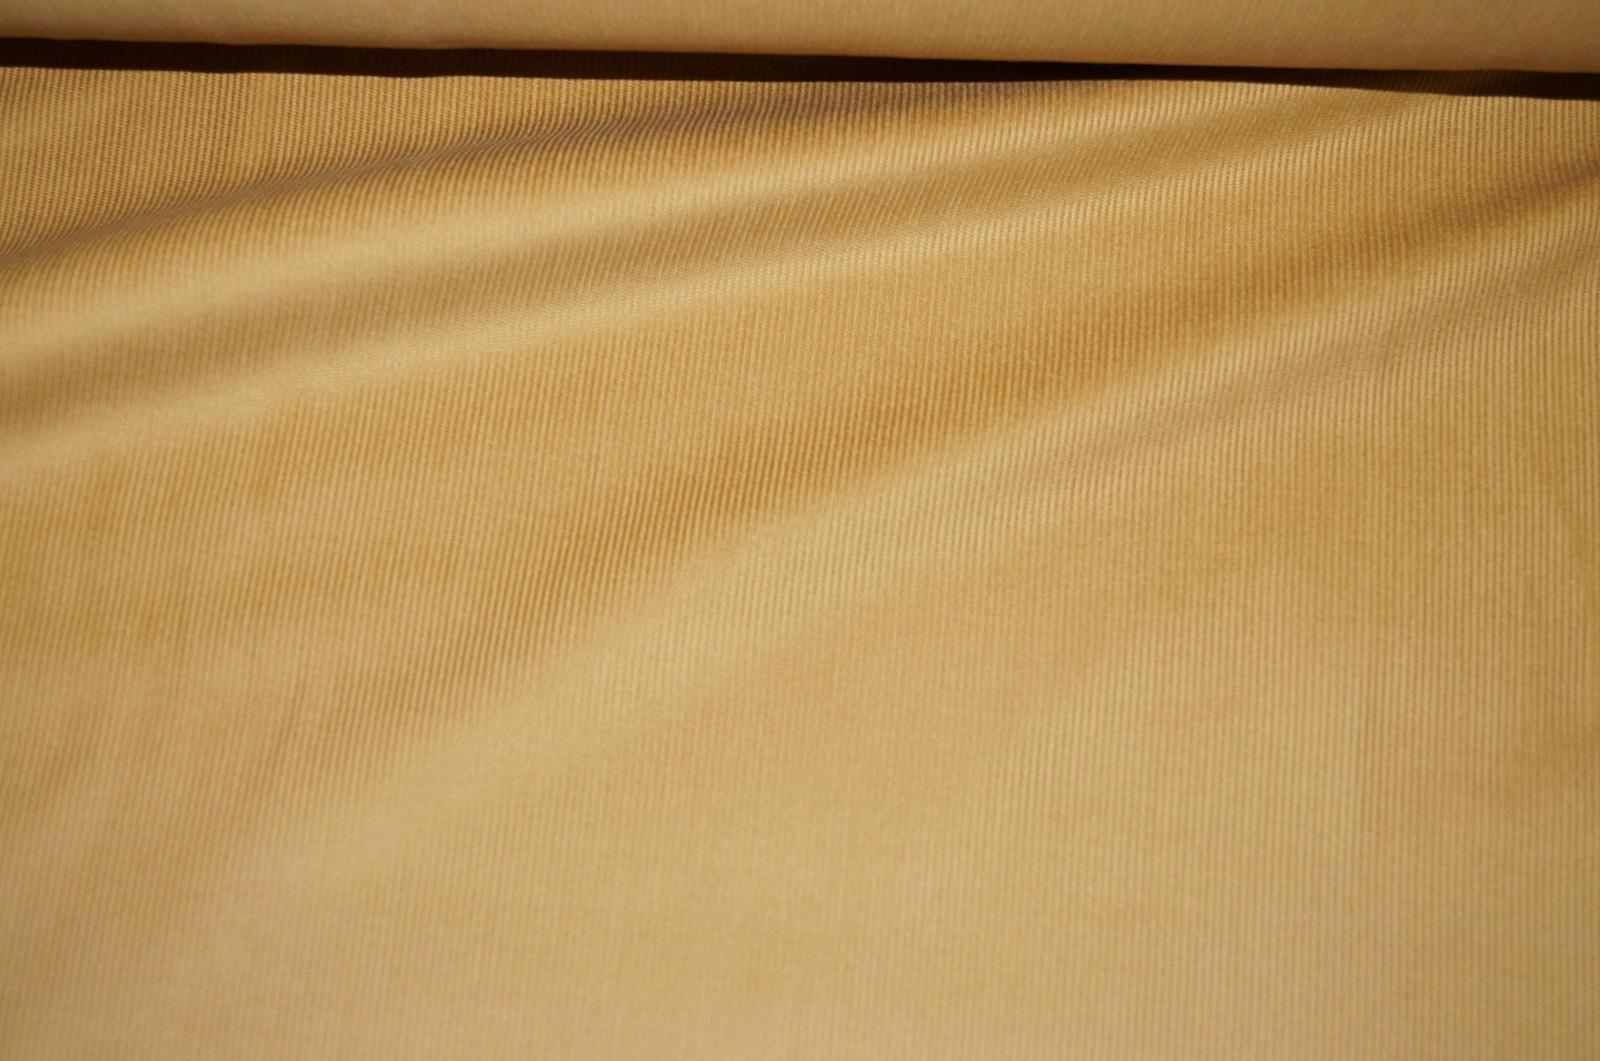 feincord stoff baumwolle feincord stoff hellbraun. Black Bedroom Furniture Sets. Home Design Ideas